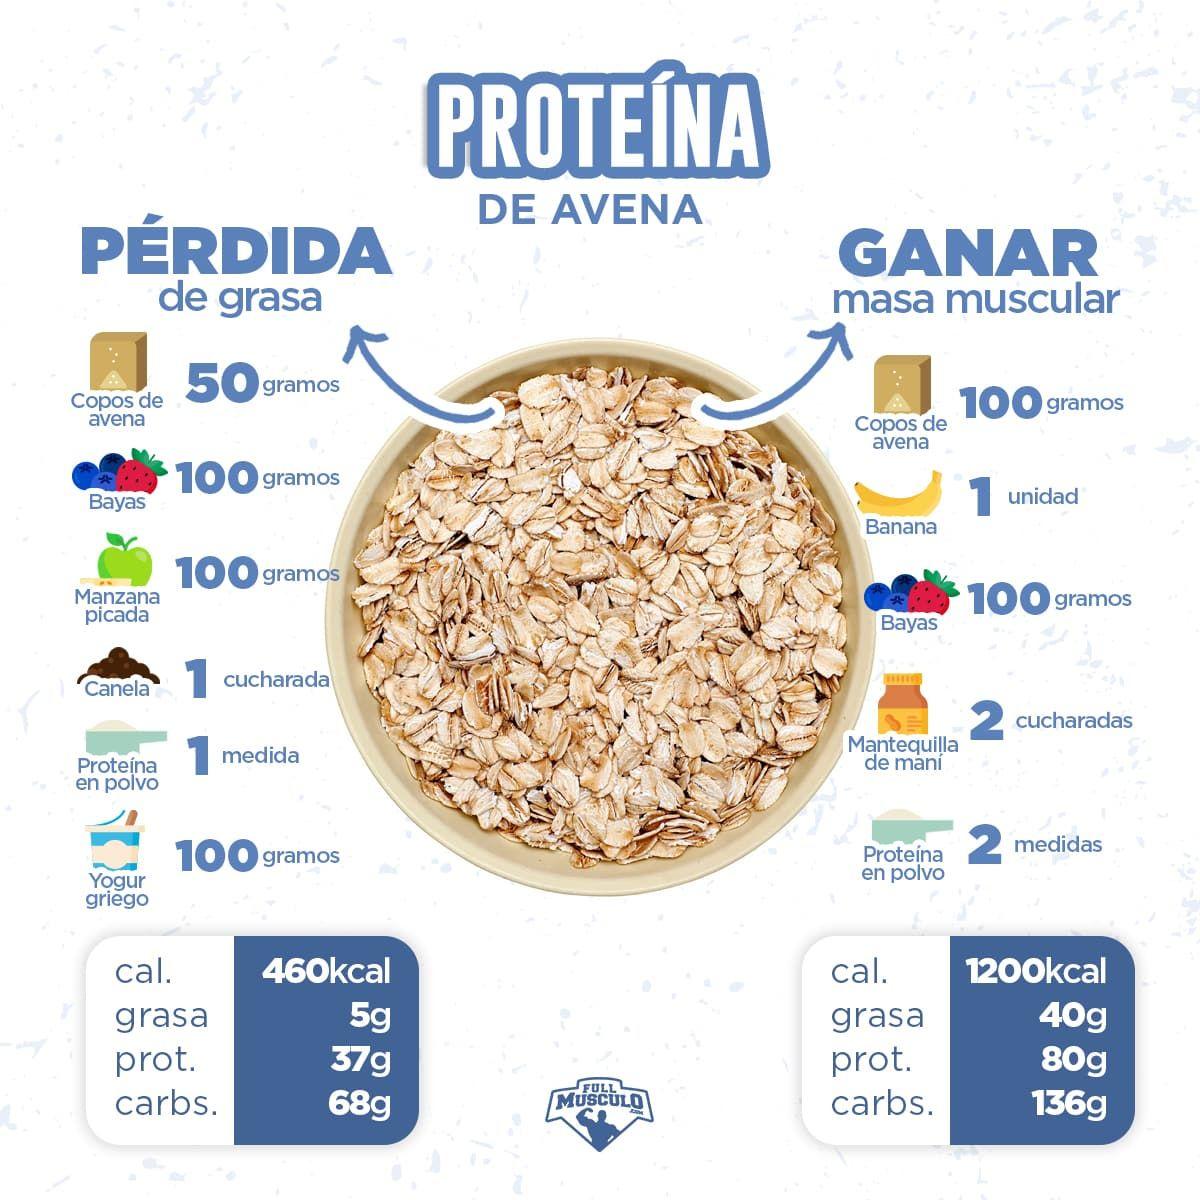 dieta rica en proteinas para ganar masa muscular